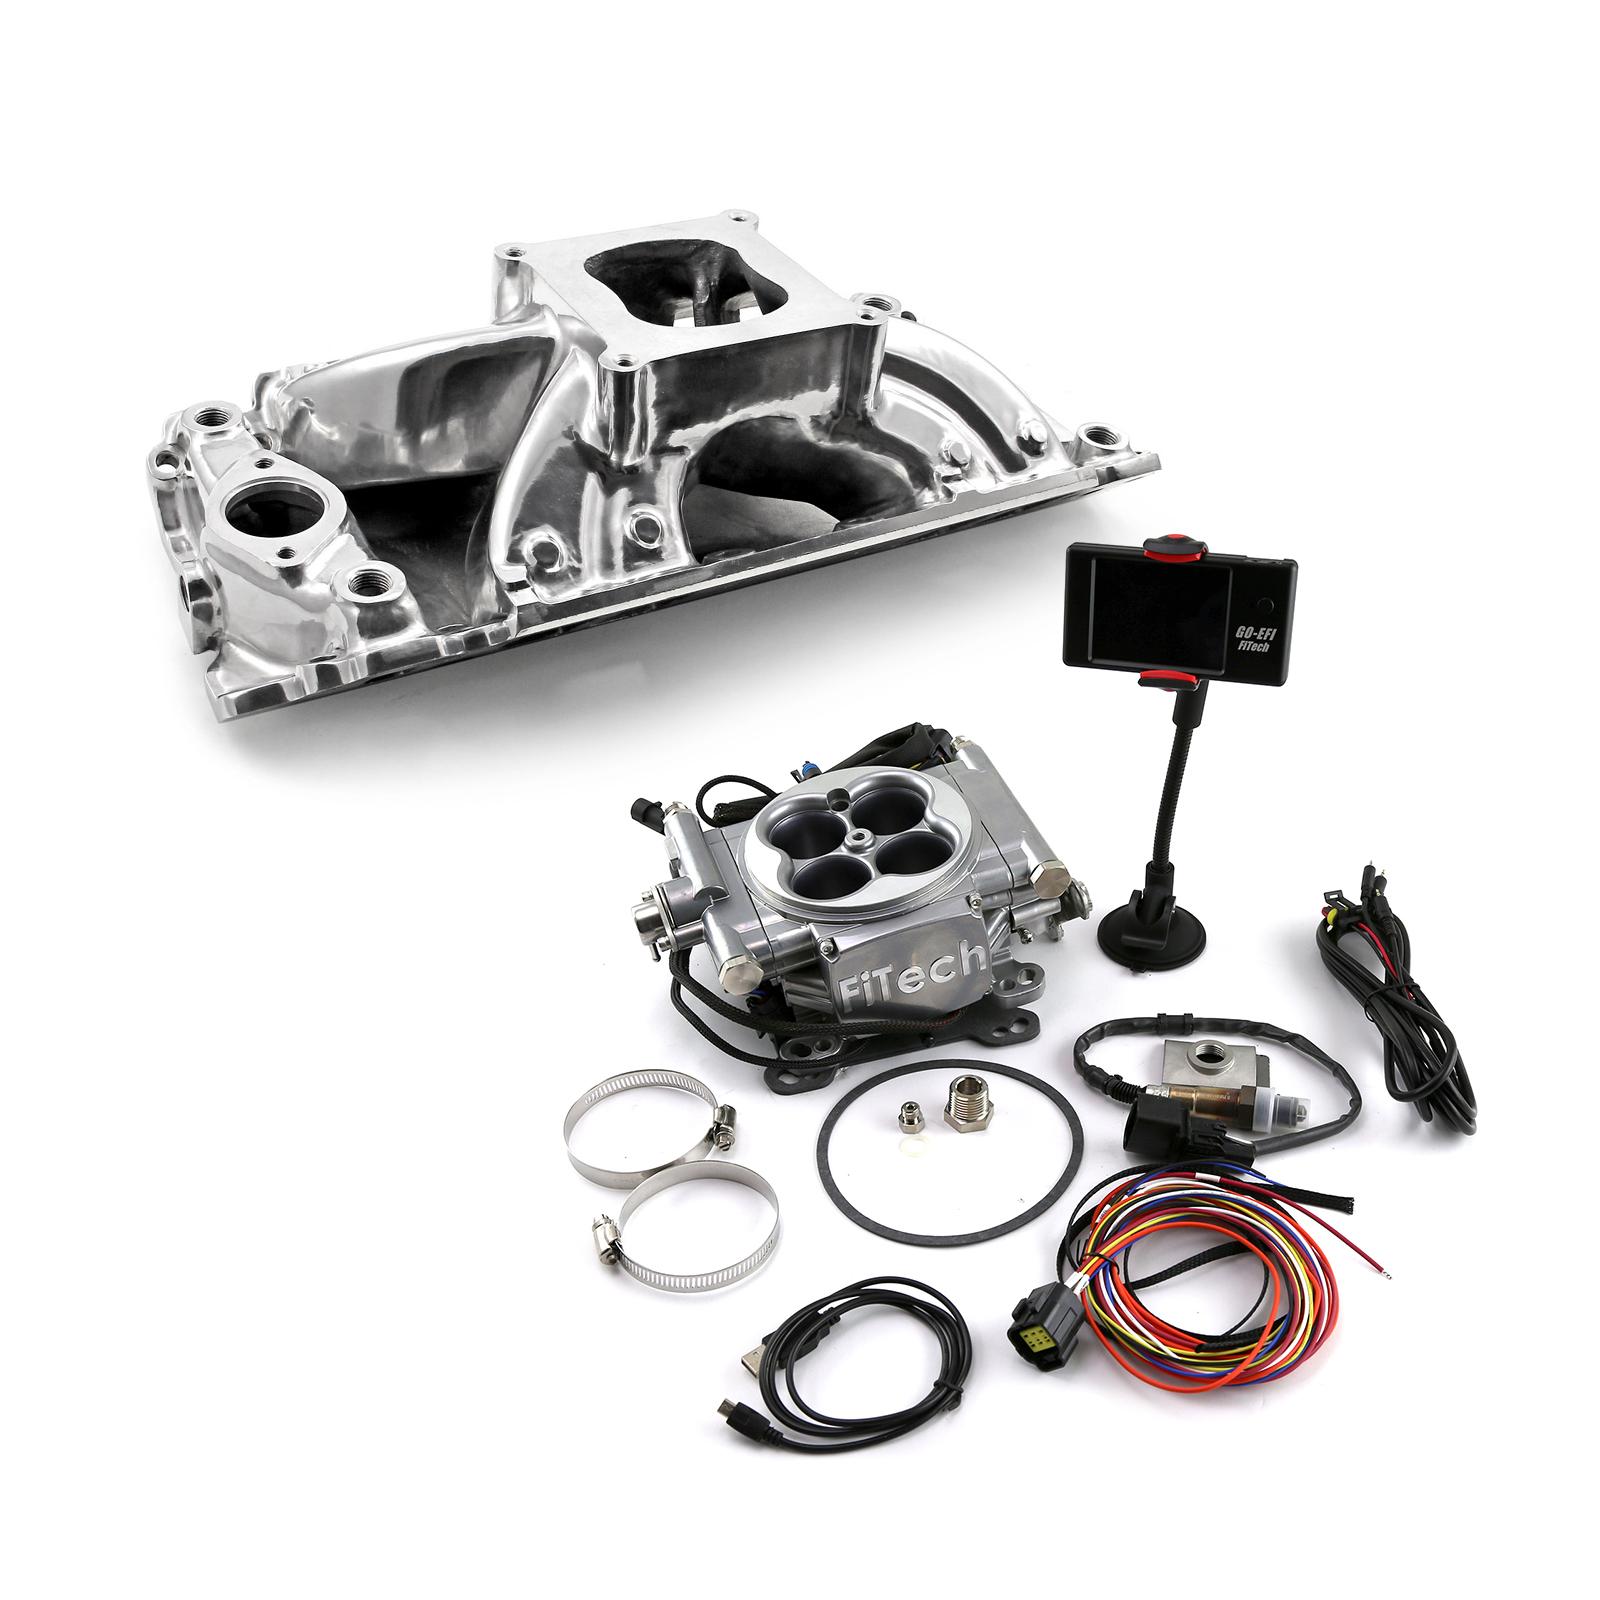 Chevy BBC 454 Shootout Rect Port Manifold & FiTech Go EFI 30001 Fuel Injection